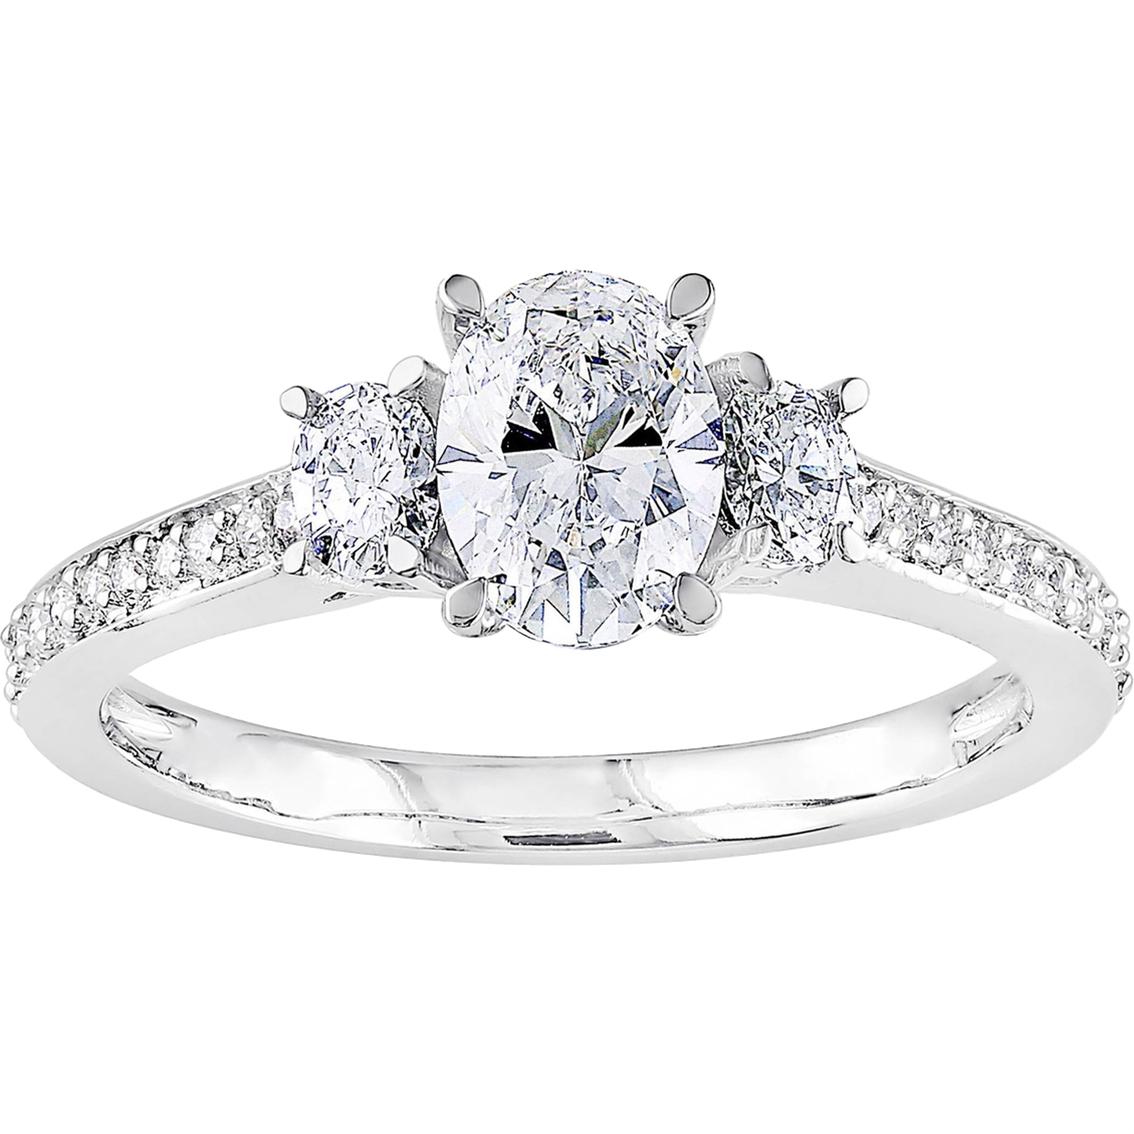 Diamore 14k White Gold 1 1 10 Ctw Oval Cut Diamond 3 Stone